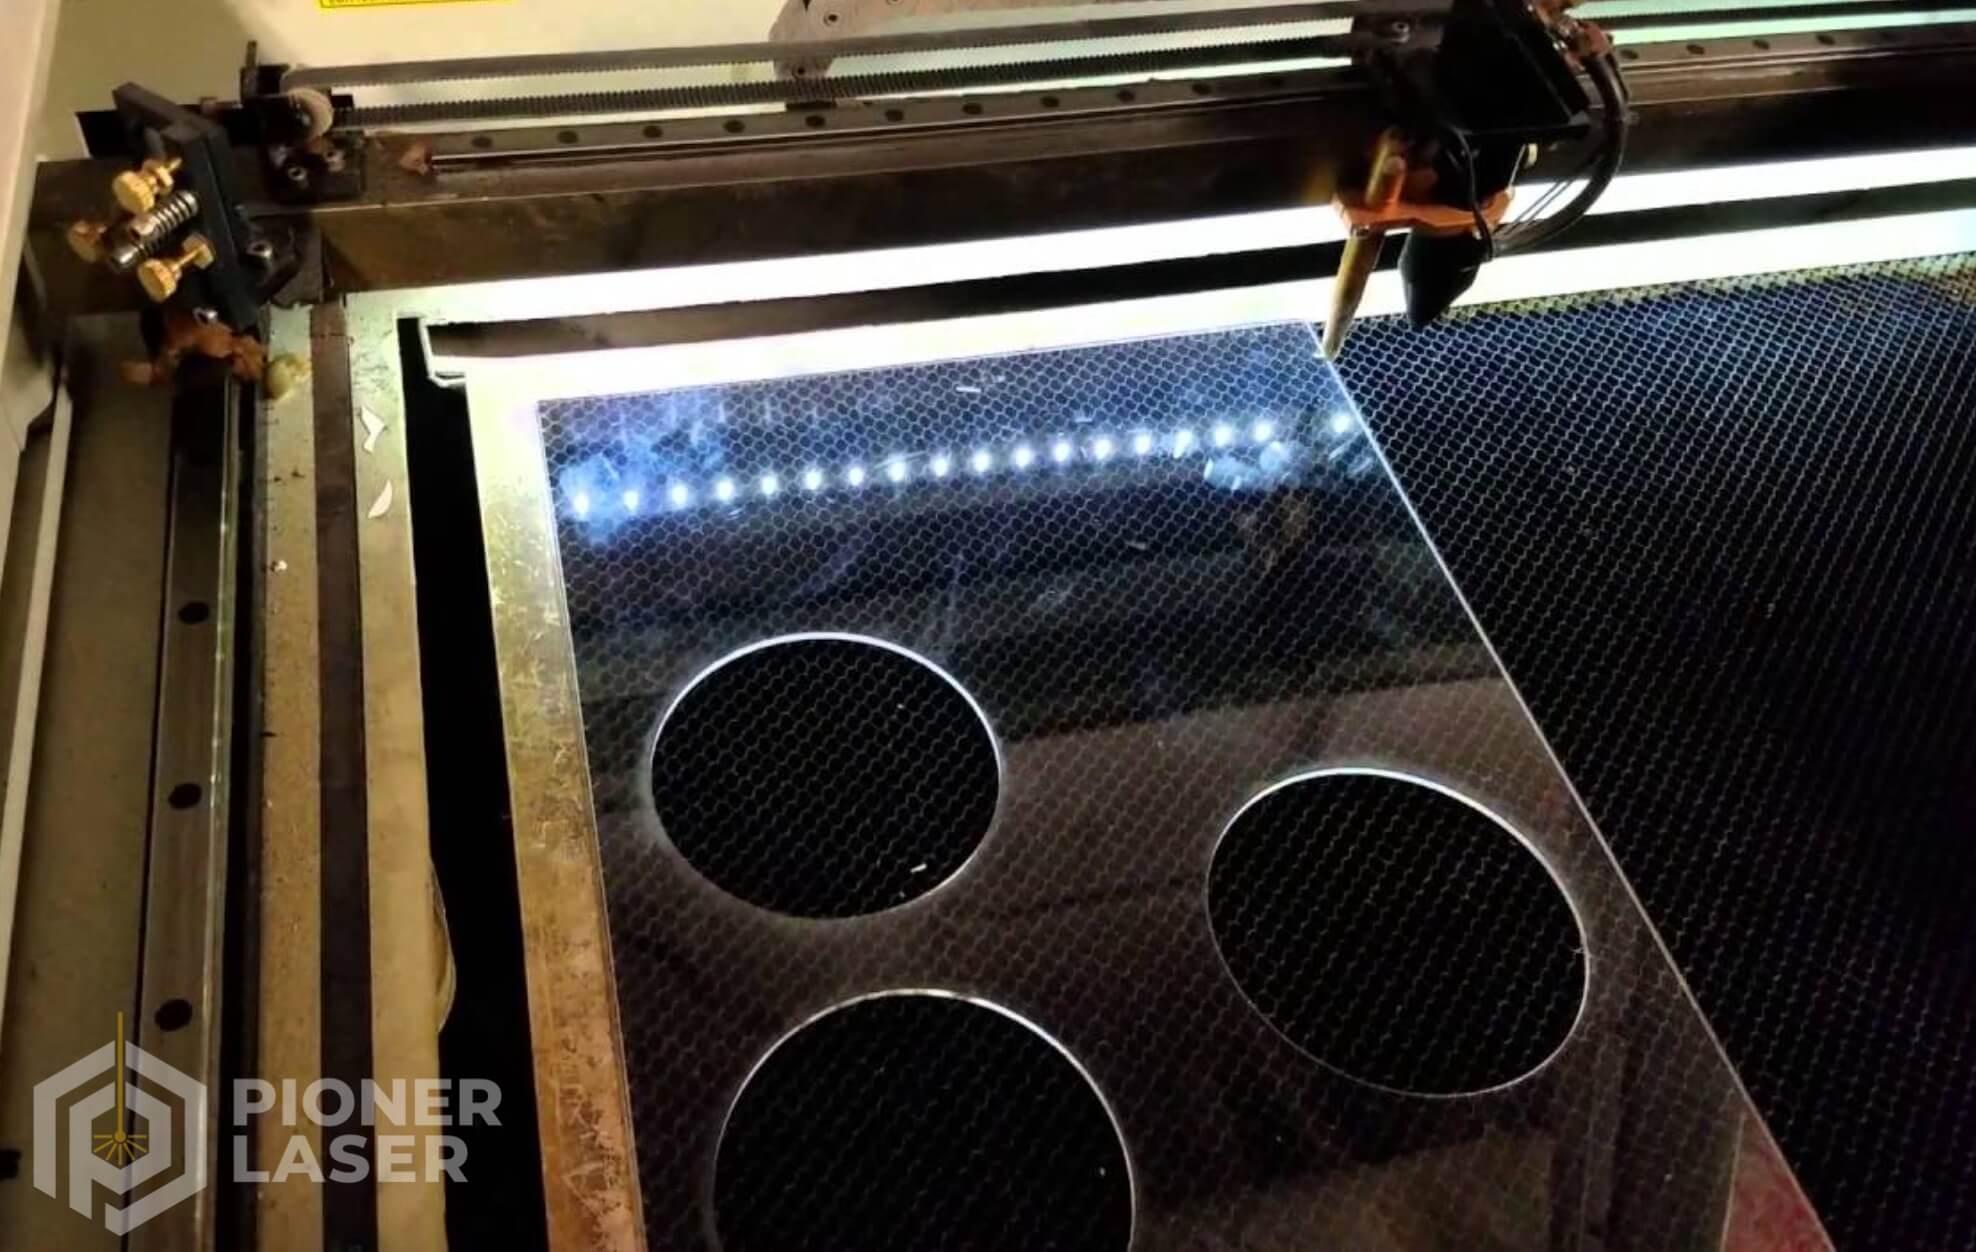 Jasa Cutting Laser Acrylic Bogor